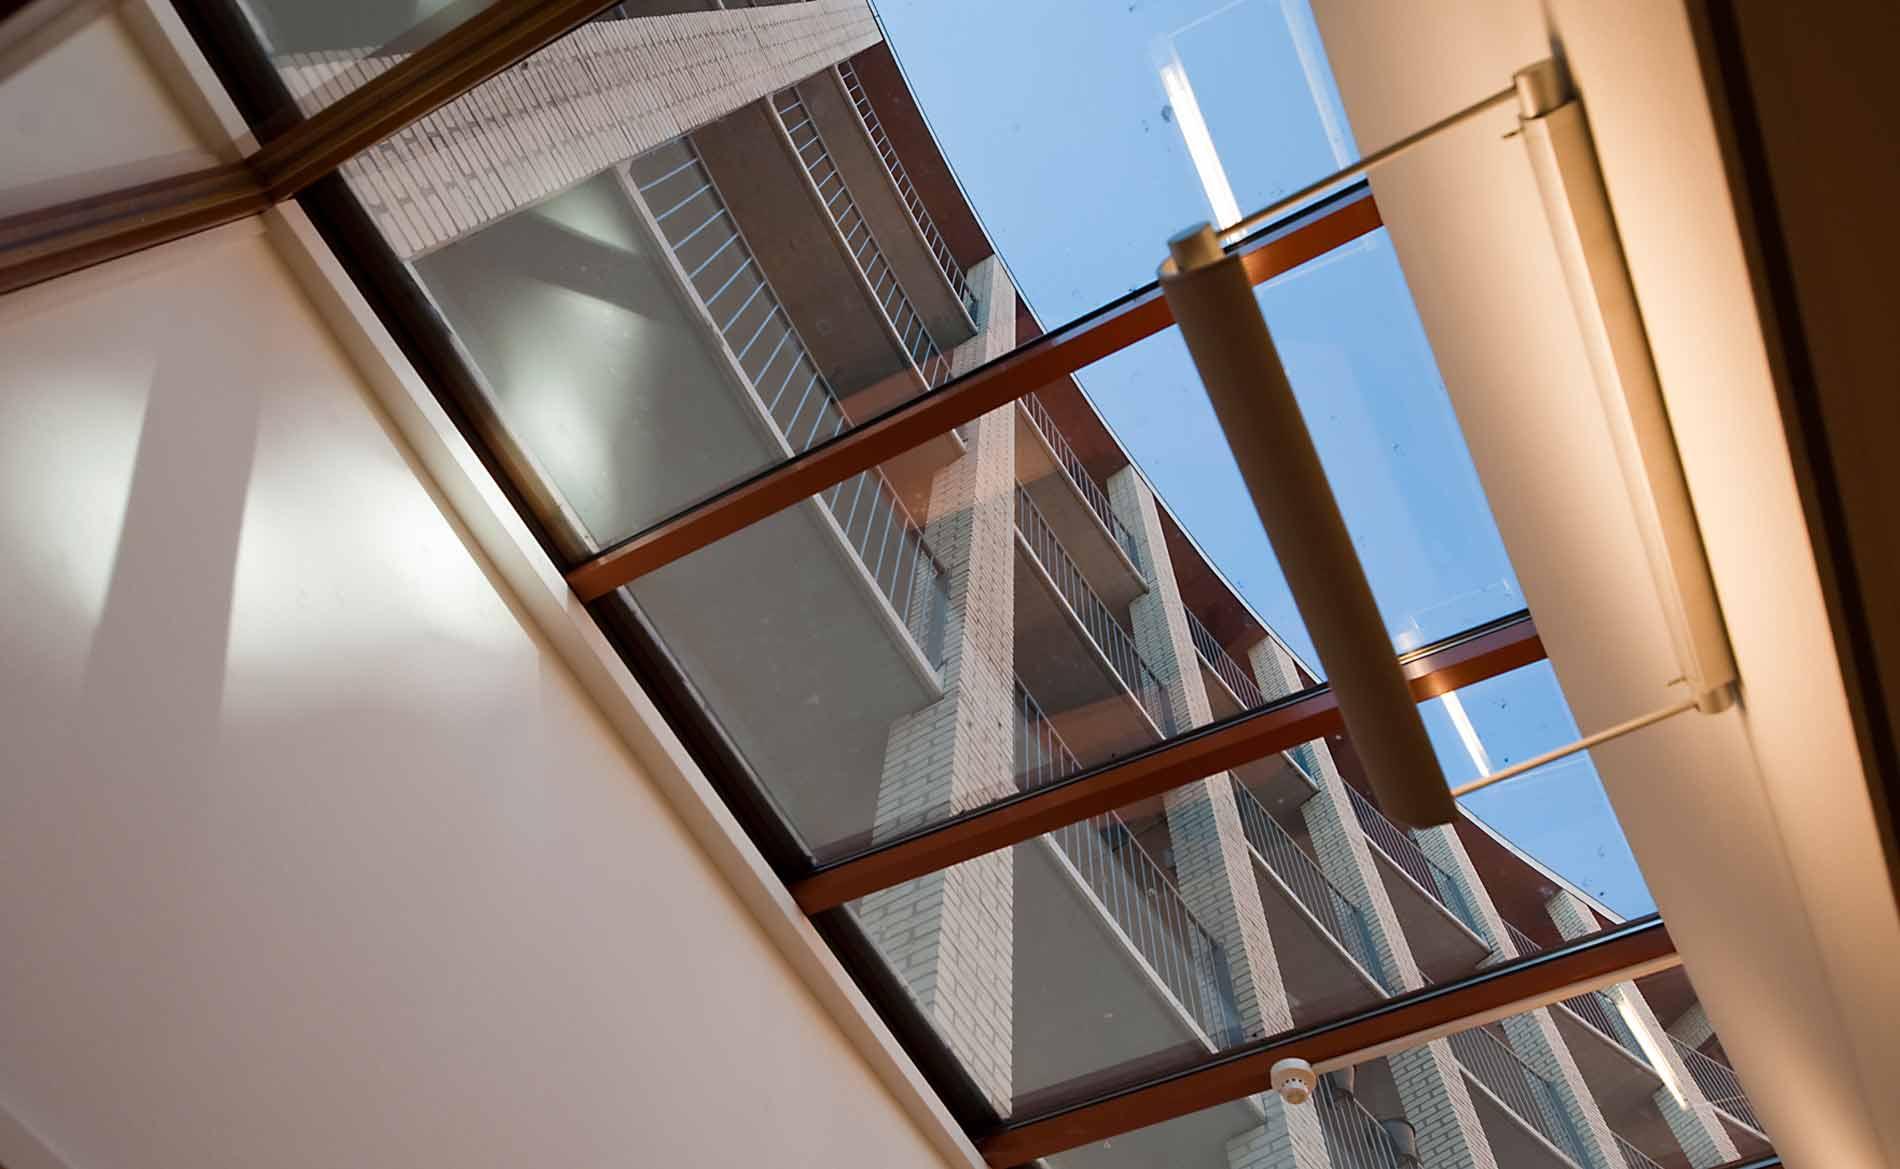 Waterrijck Heemskerk BBHD architecten woonzorggebouw herstructurering architectuur zorg